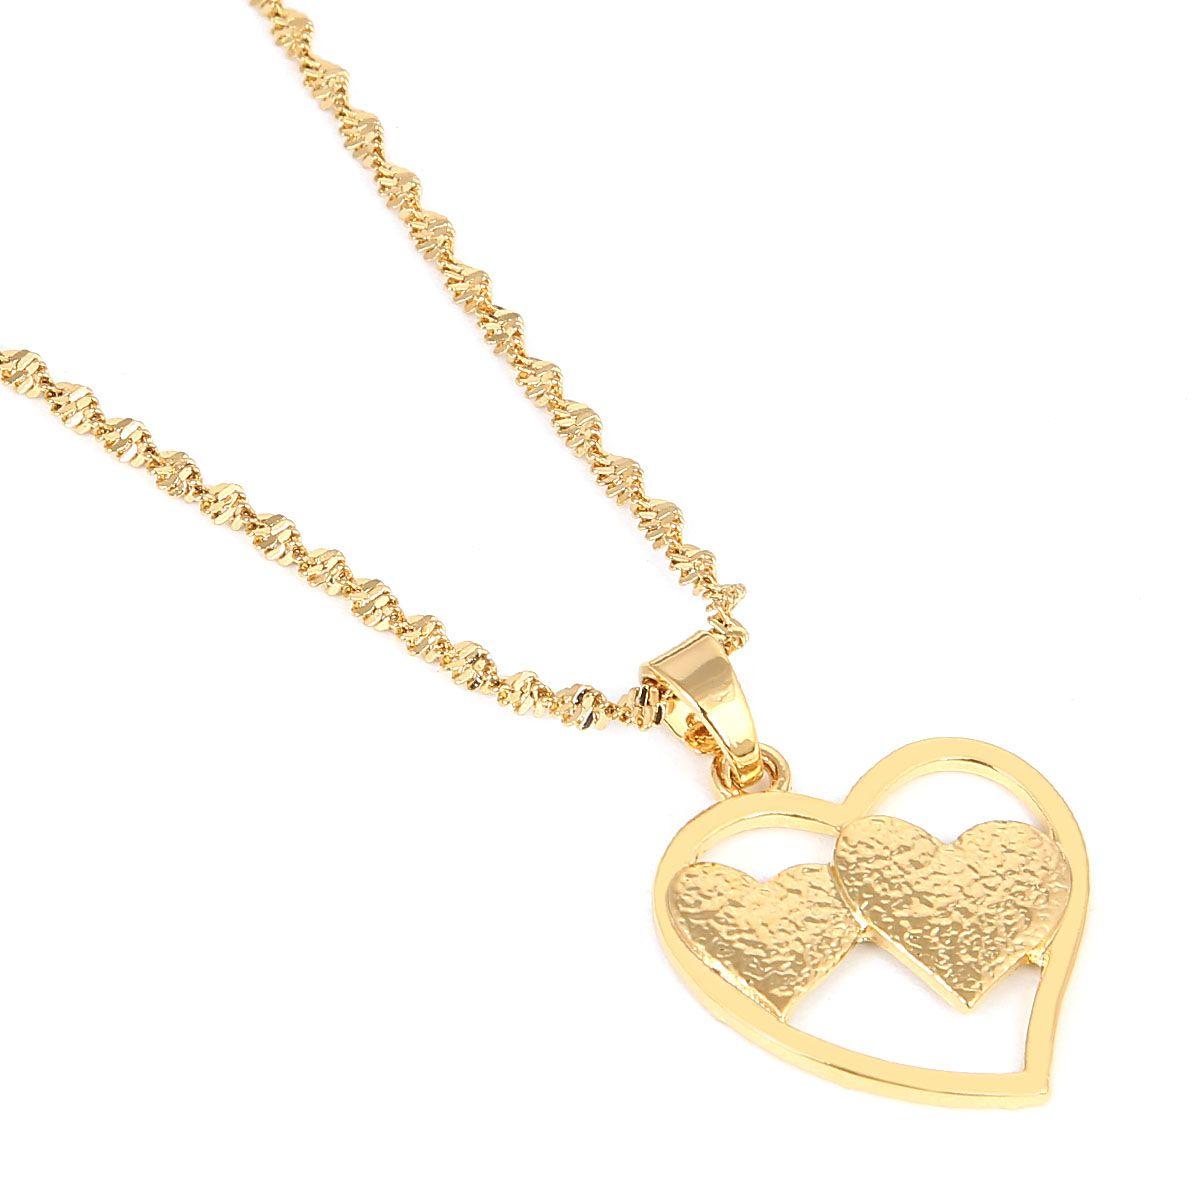 Corazón Colgante Collar Cadena Color Oro Amor Romántico Joyería Moda Mujer Chica Bonito regalo